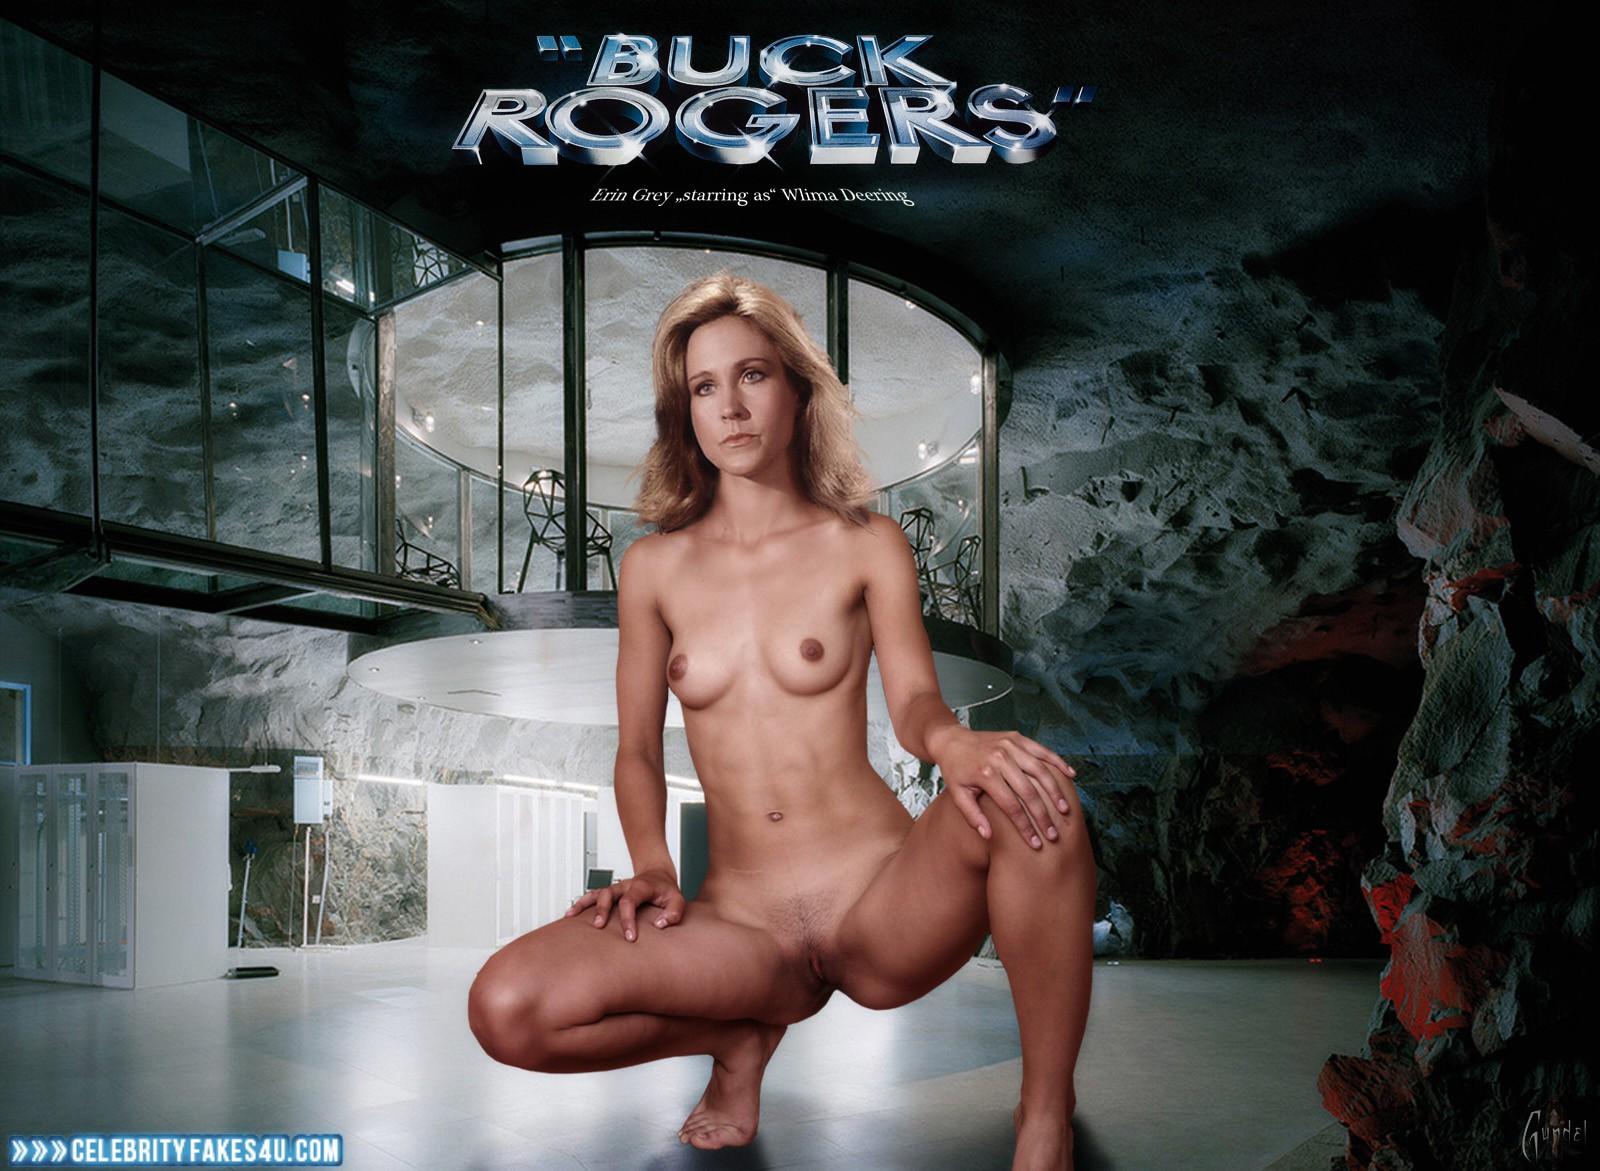 Kimberly wyatt nude fakes